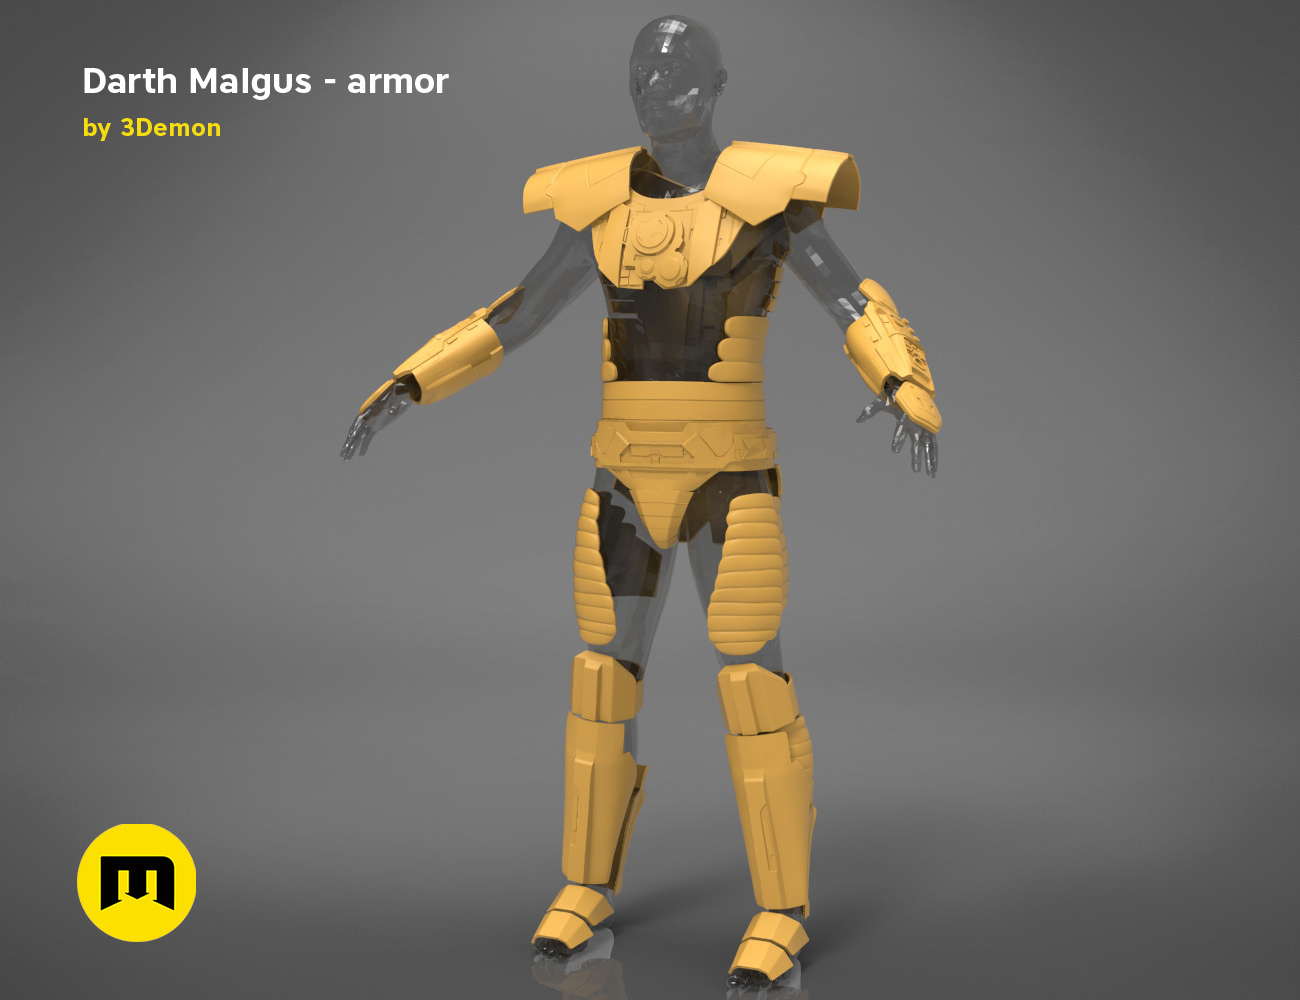 Darth-Malgus-armor-render_scene_basic.101 kopie.jpg Download STL file Darth Malgus's full size armor • Design to 3D print, 3D-mon